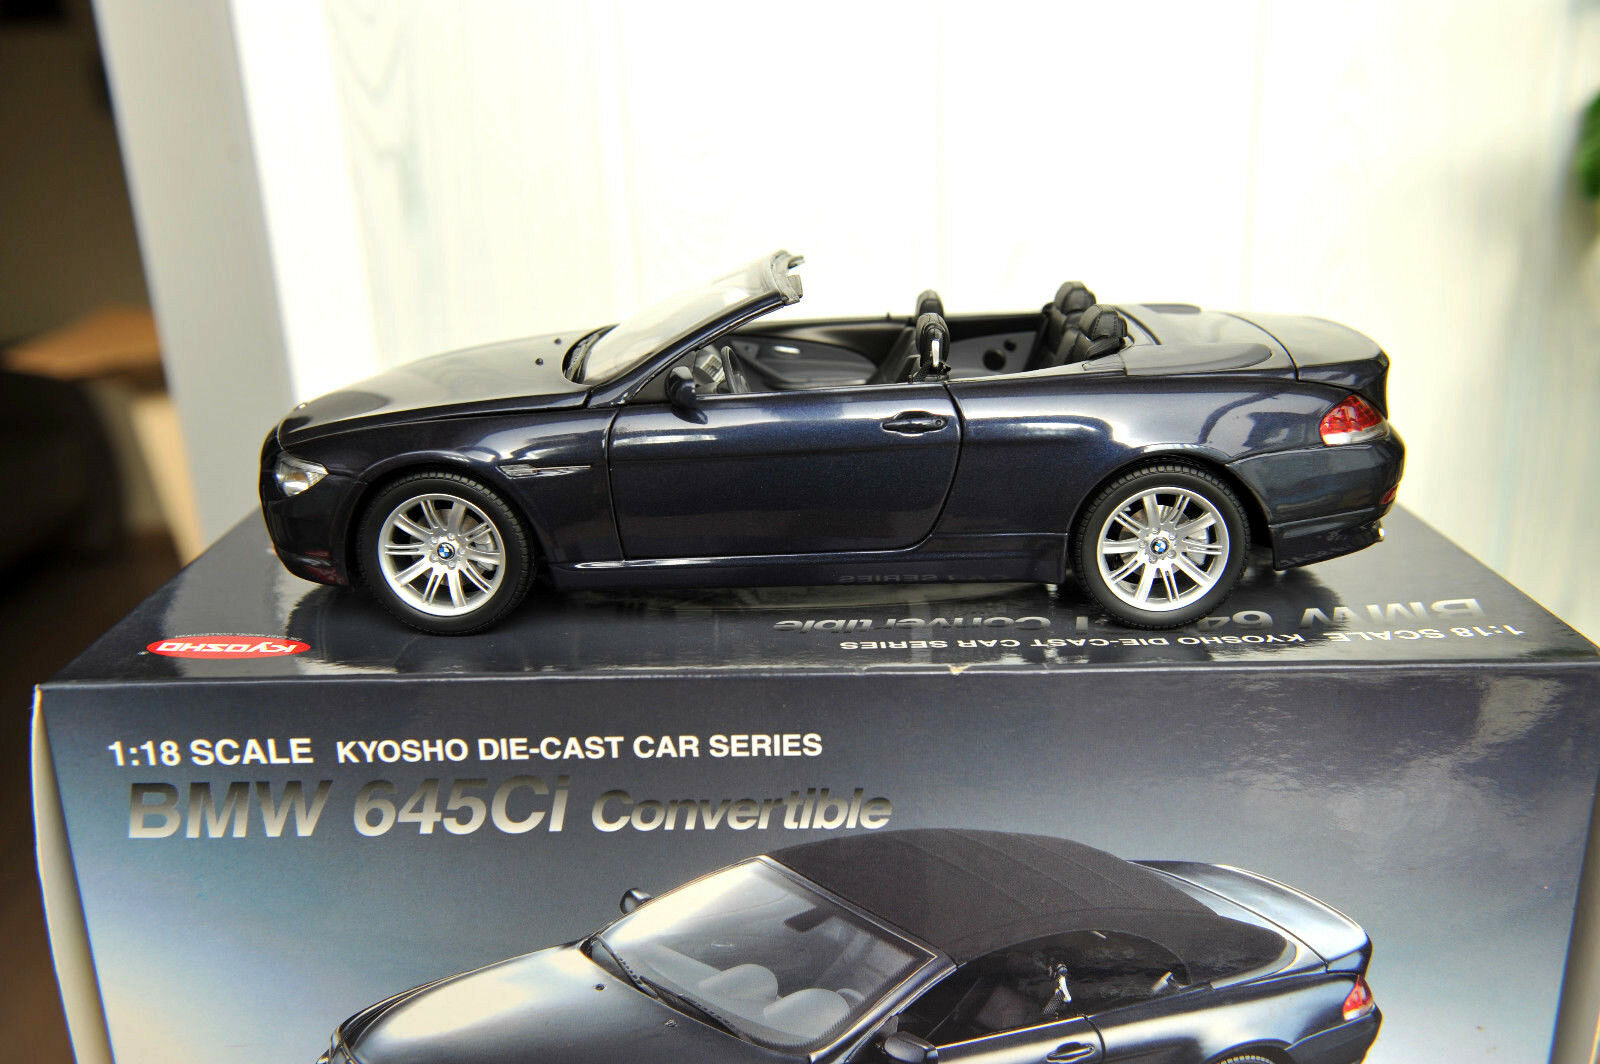 BMW 645 CI CONverdeIBLE NAVY azul KYOSHO 1 18 ETAT NEUF